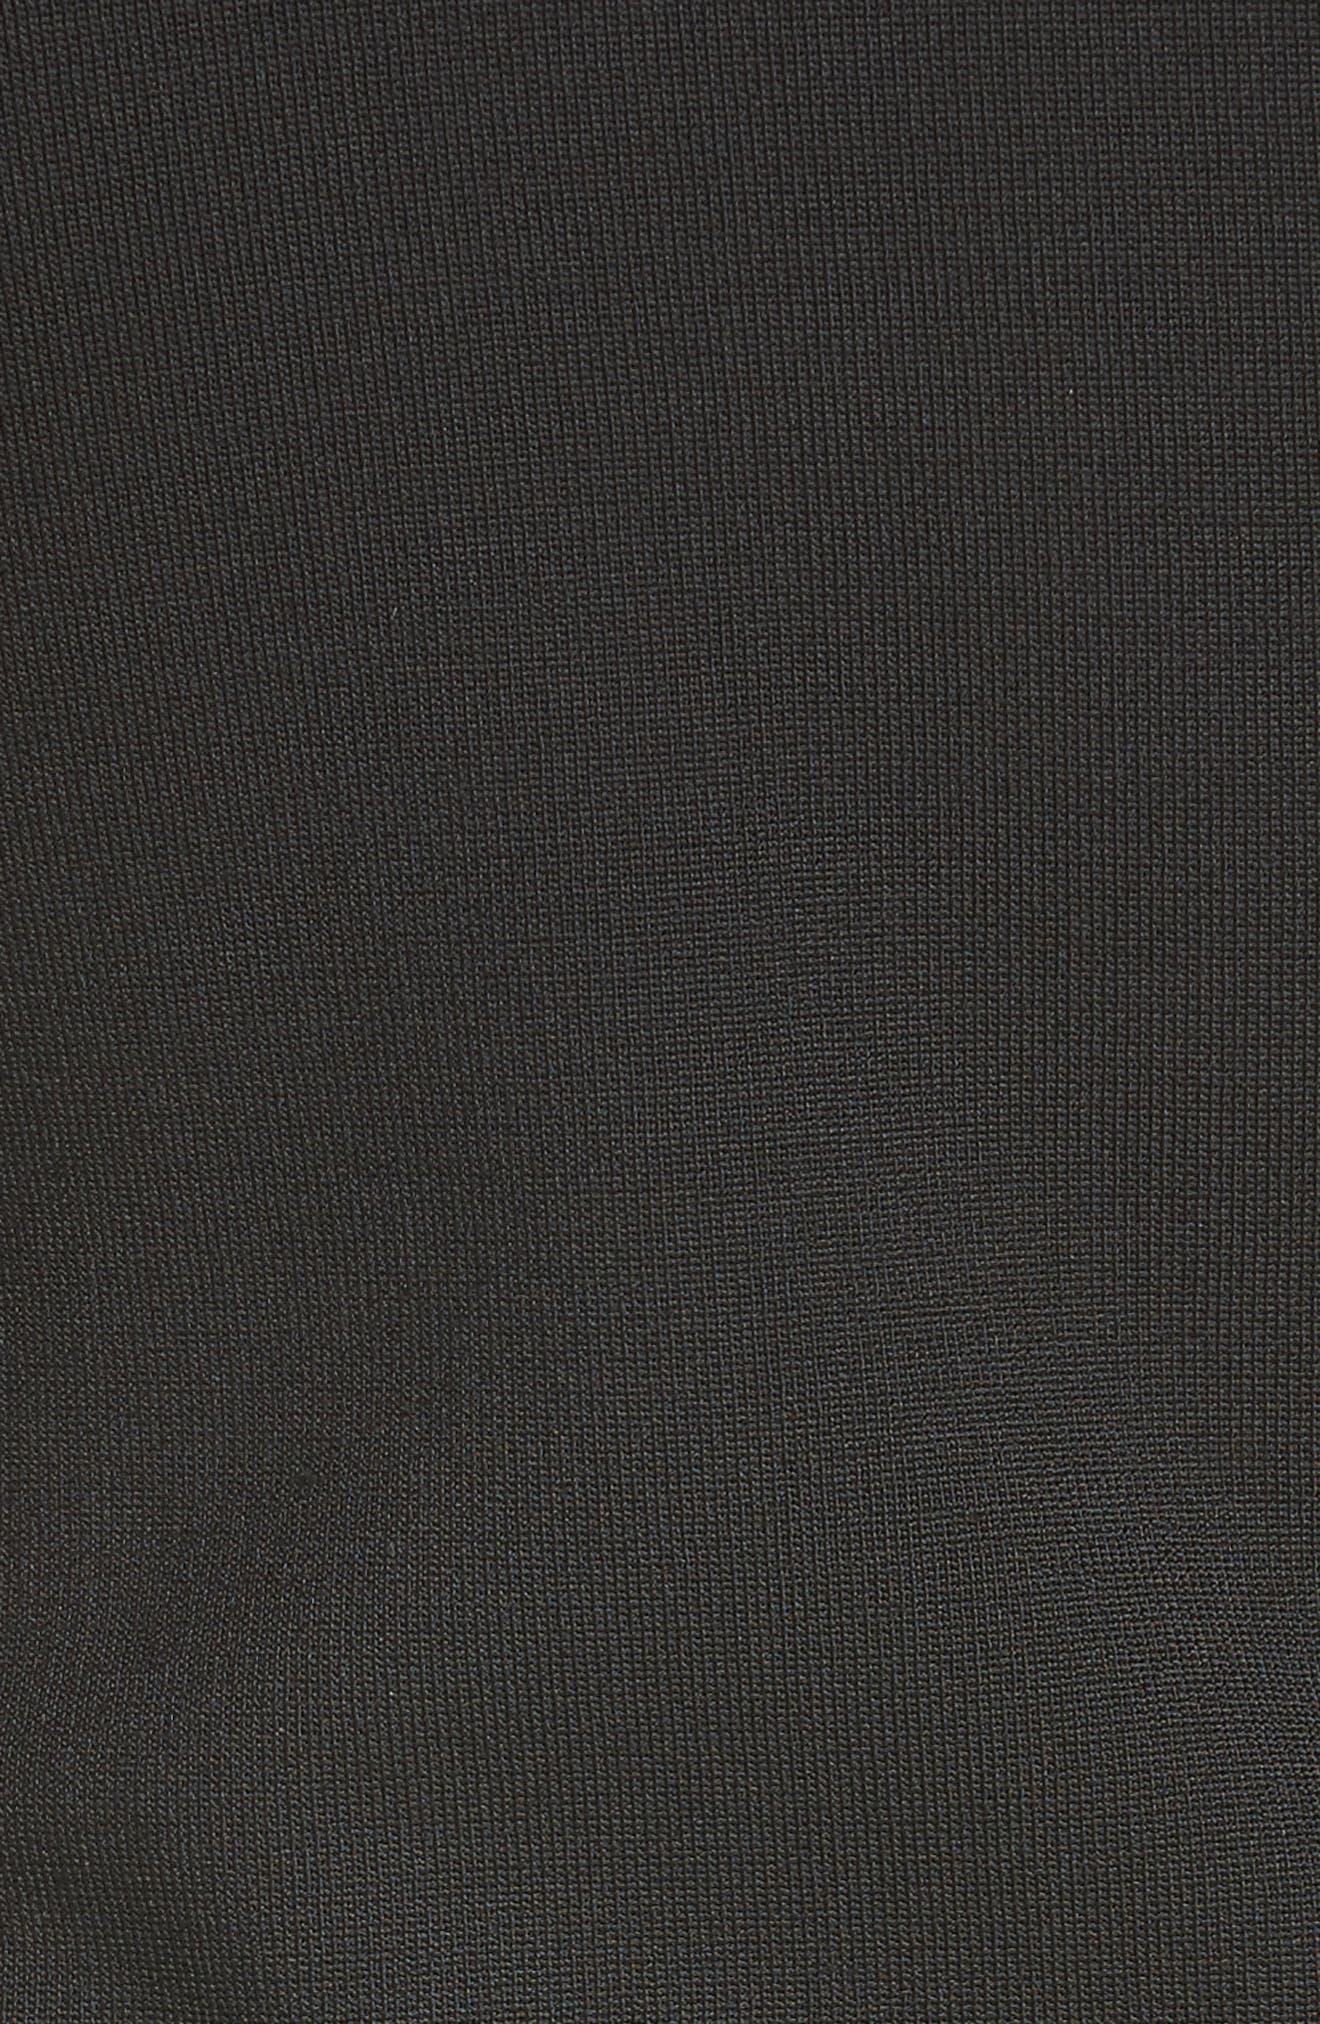 Alternate Image 3  - Alexander Wang Chain Trim Bell Sleeve Top